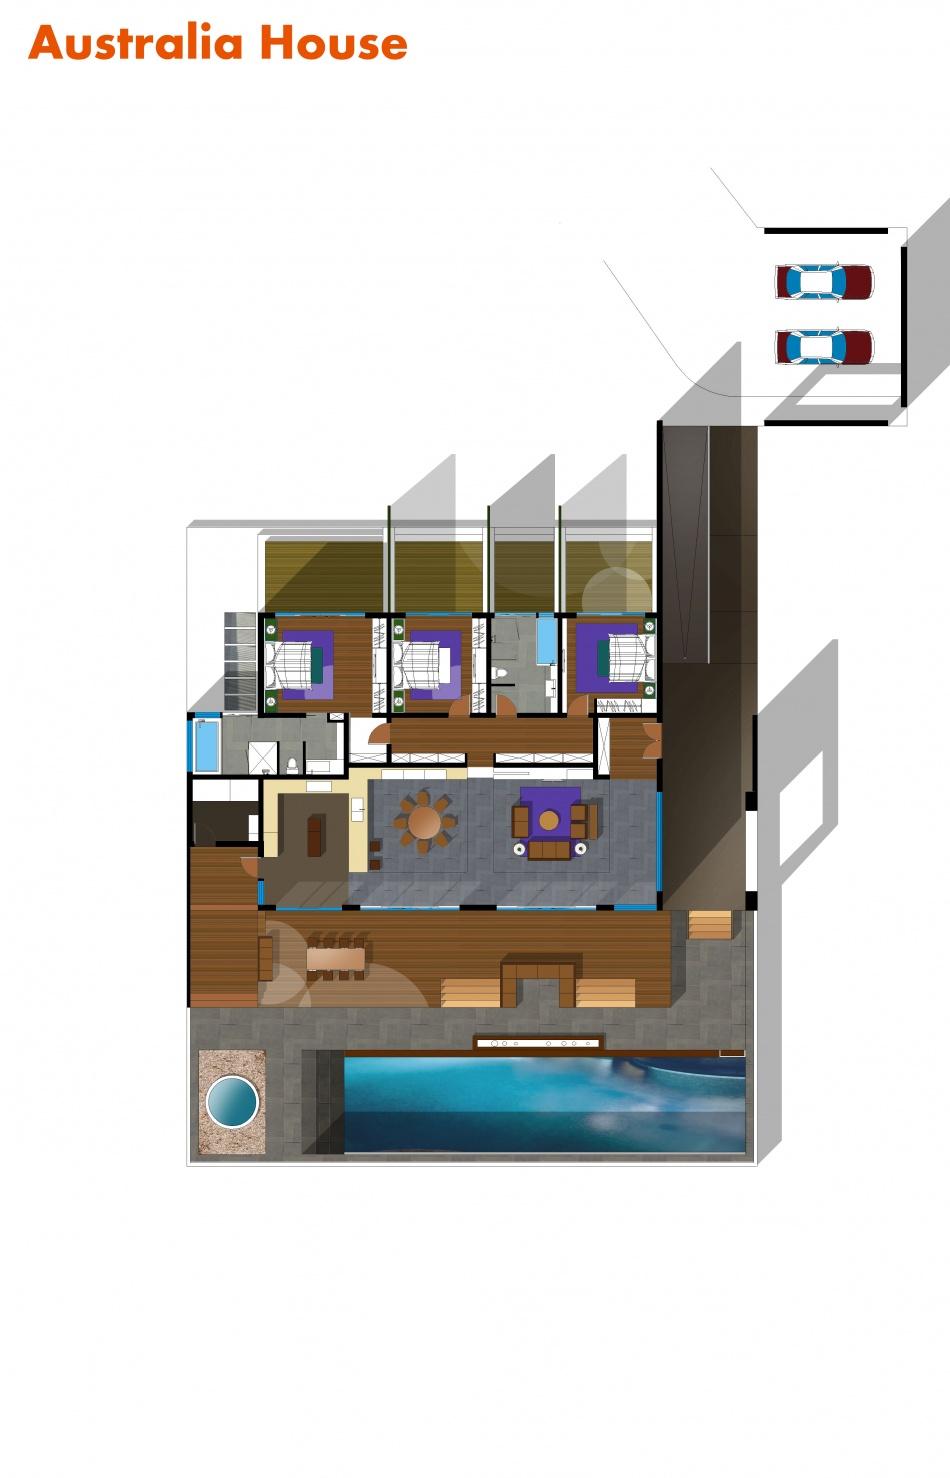 Australiahouse客厅潮流混搭客厅设计图片赏析